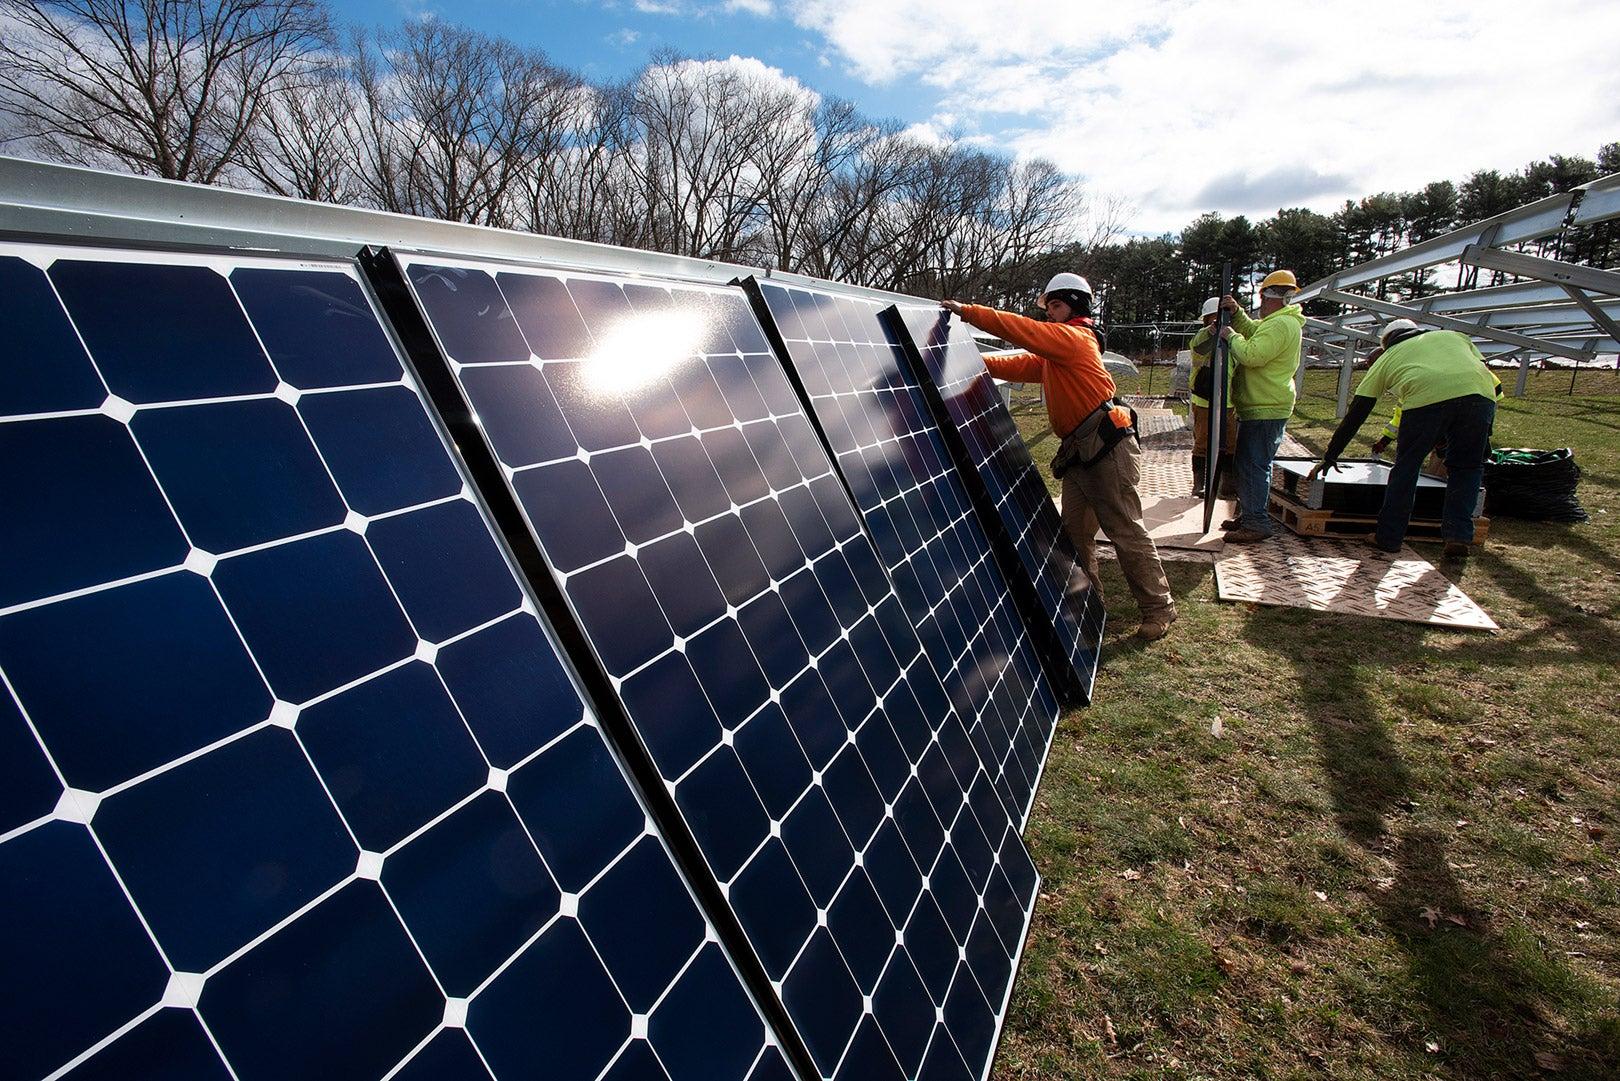 Arboretum gets solar boost with massive Harvard sustainability initiative